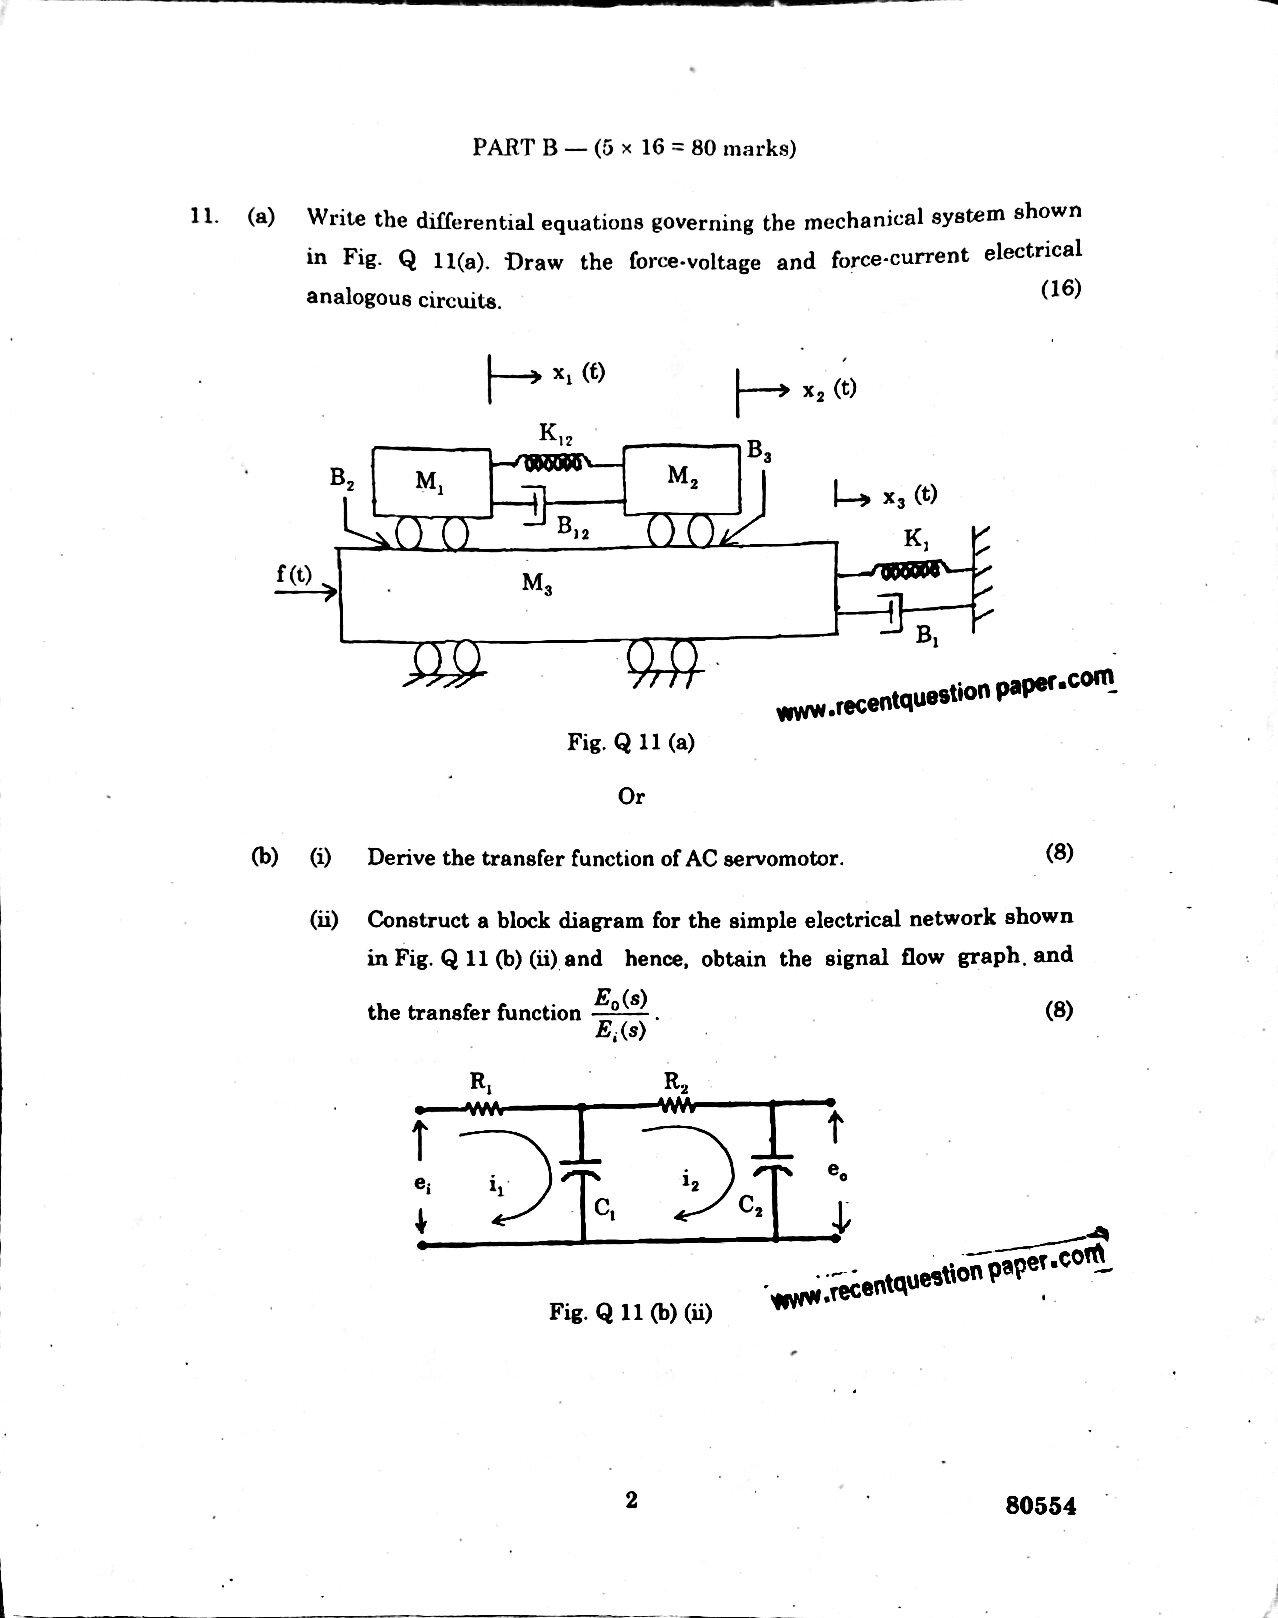 IC6501 Control Systems University Question paper Nov/Dec 2016 Pdf